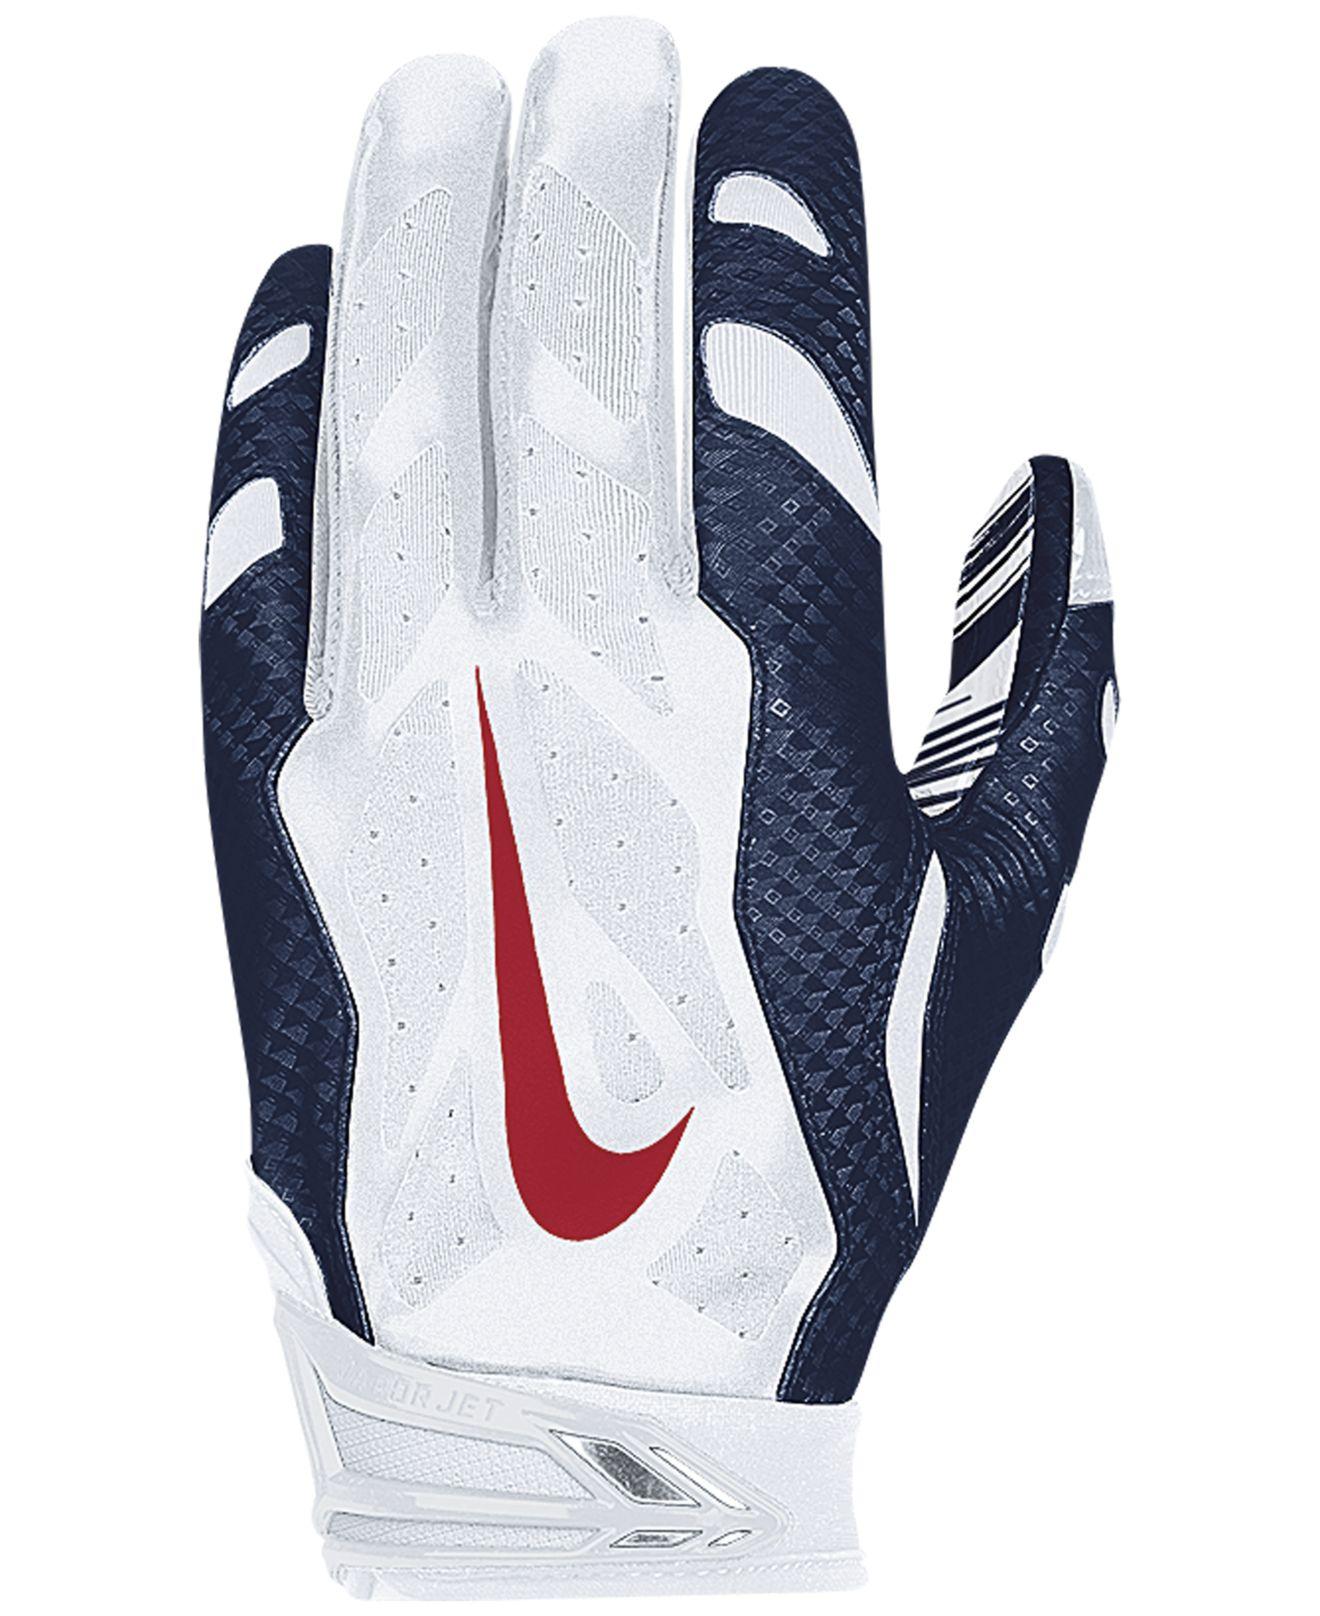 Lyst - Nike New England Patriots 30 Vapor Jet Gloves in Blue for Men 30ed2a6c6